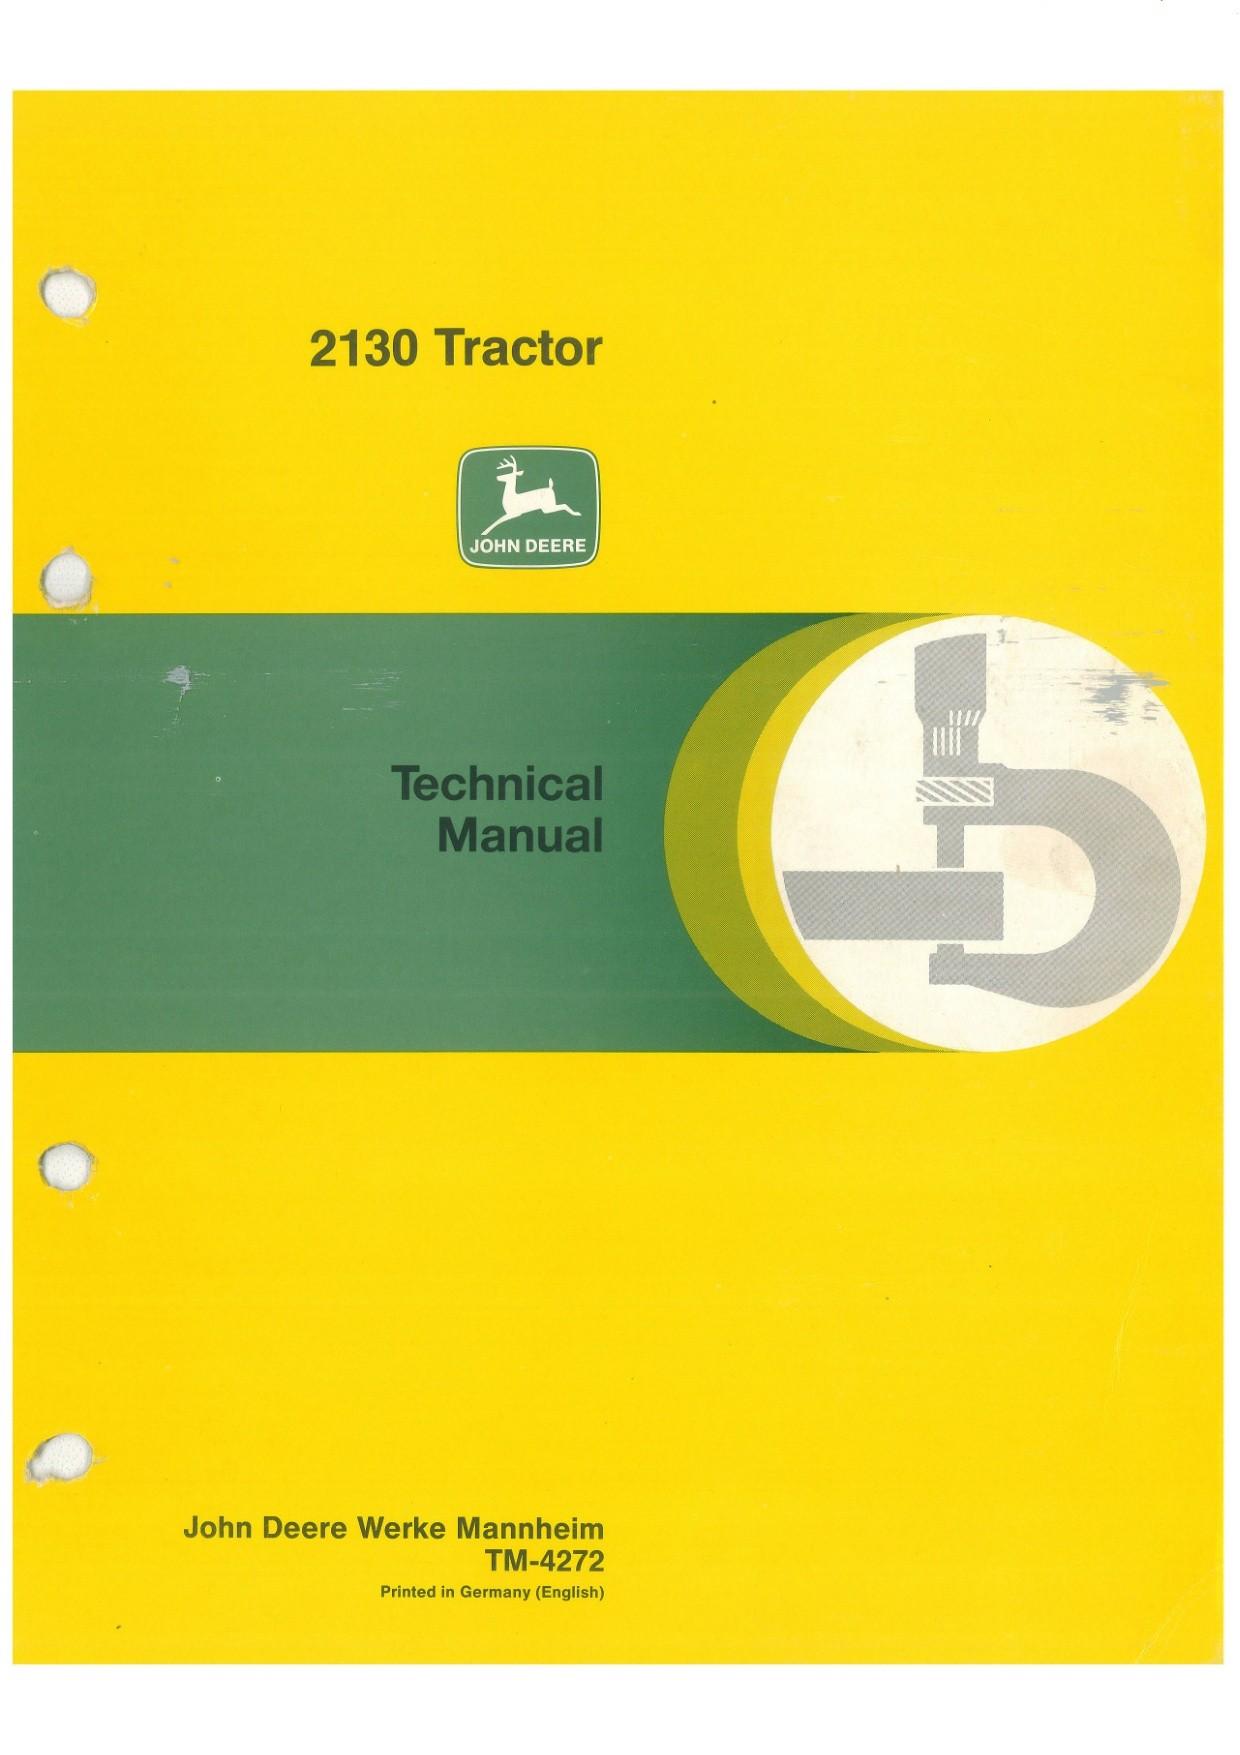 John Deere 2130 technical manual  -  TM4272  -  english